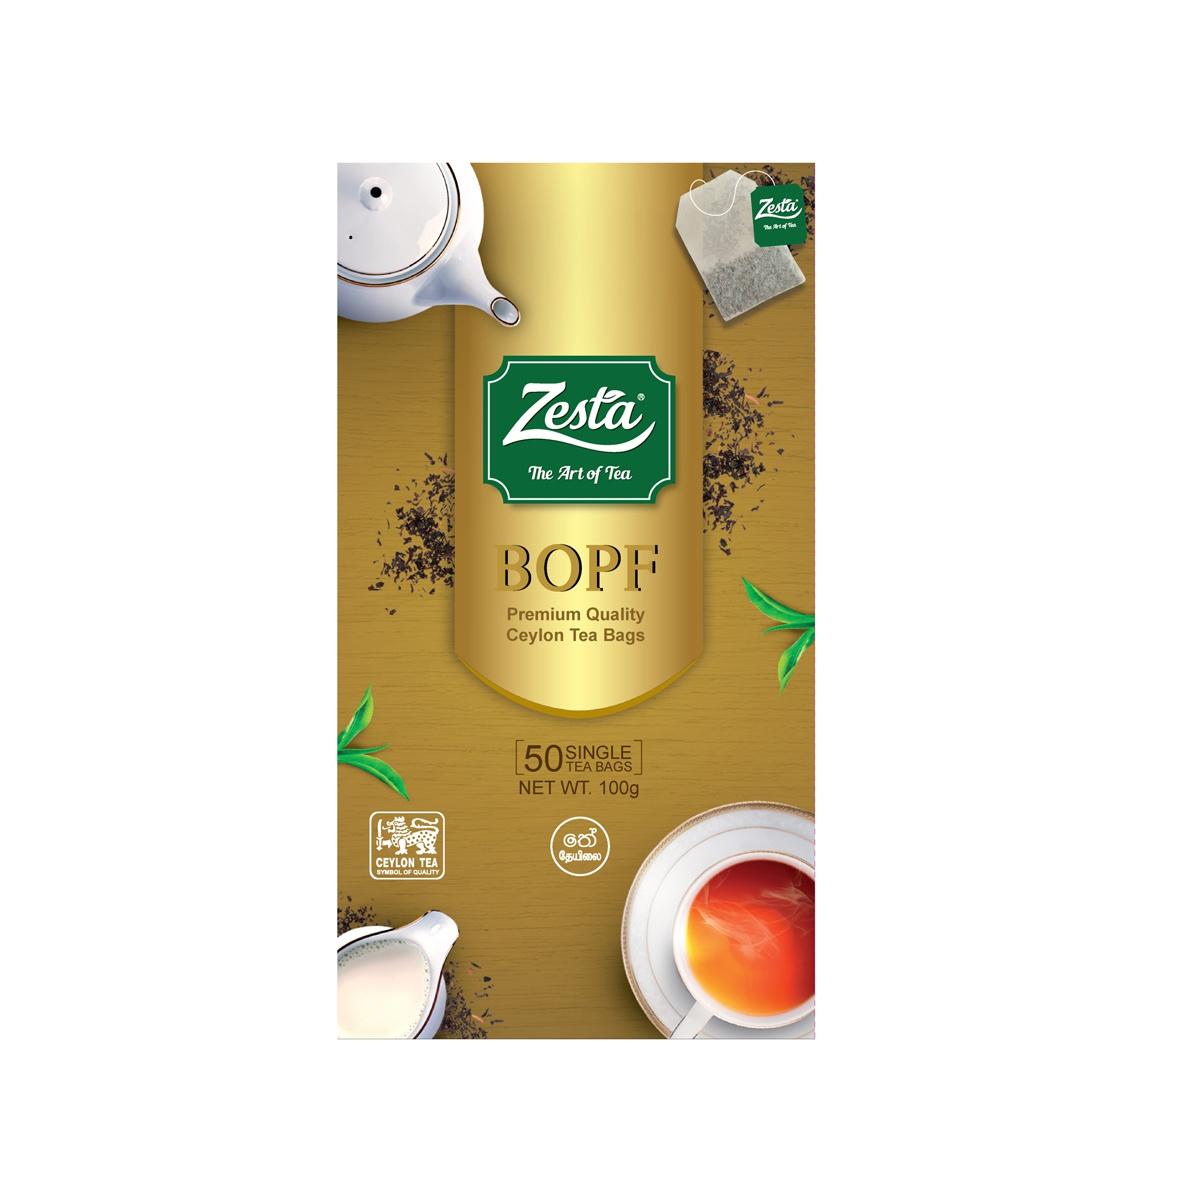 Zesta Tea 50s 100g - in Sri Lanka